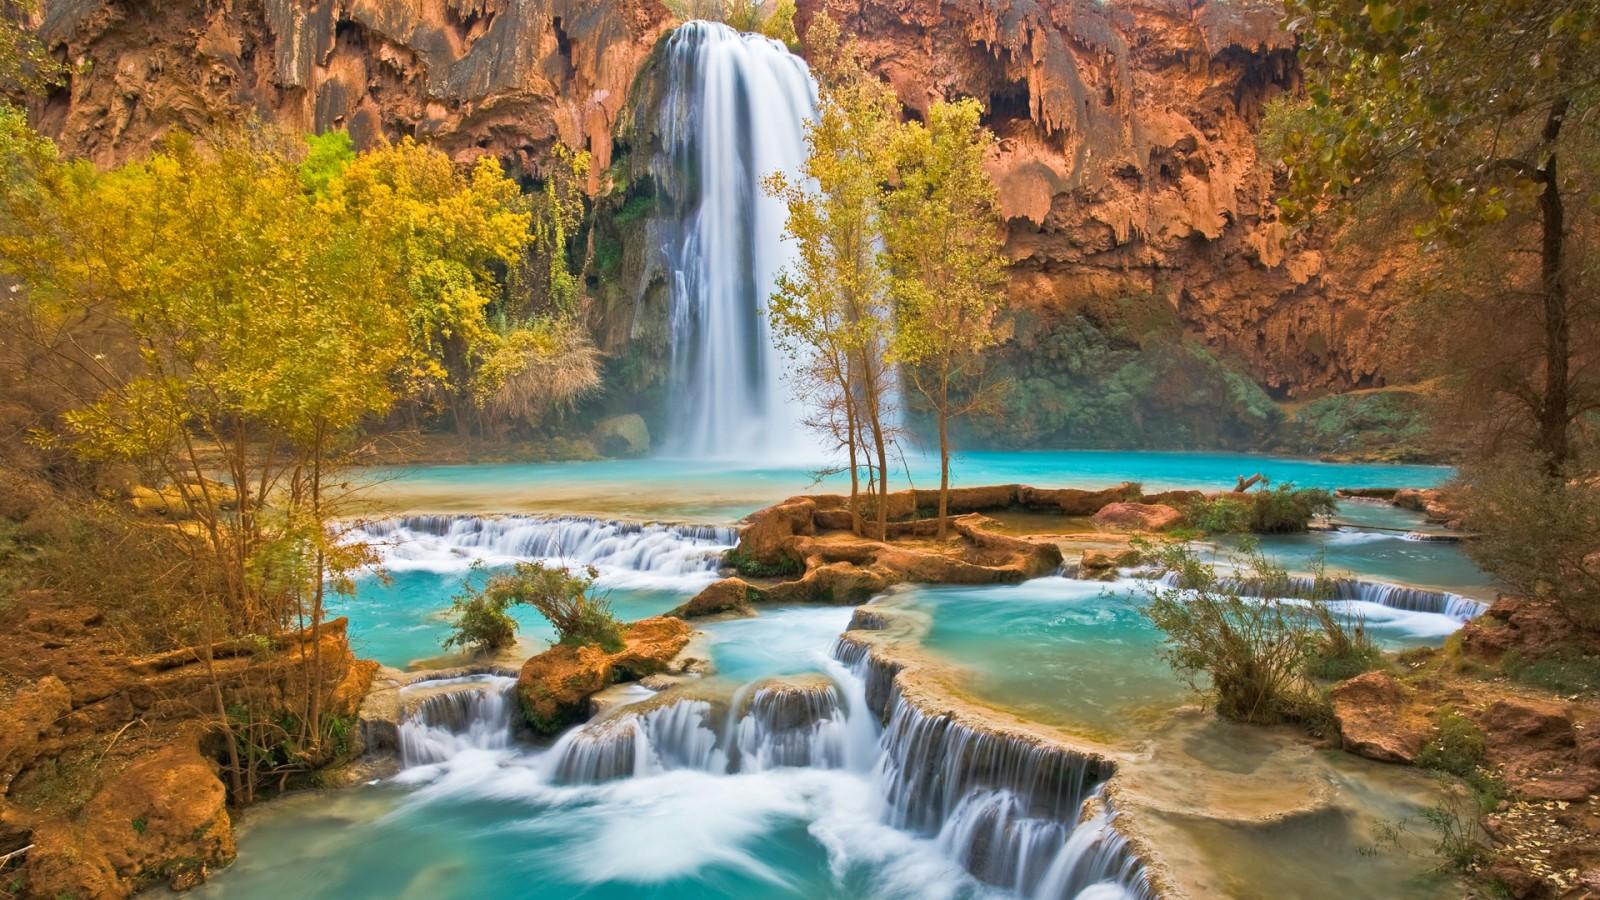 Canyon Oasis Havasu Falls Arizona   HD Wallpaper 1600x900 1600x900